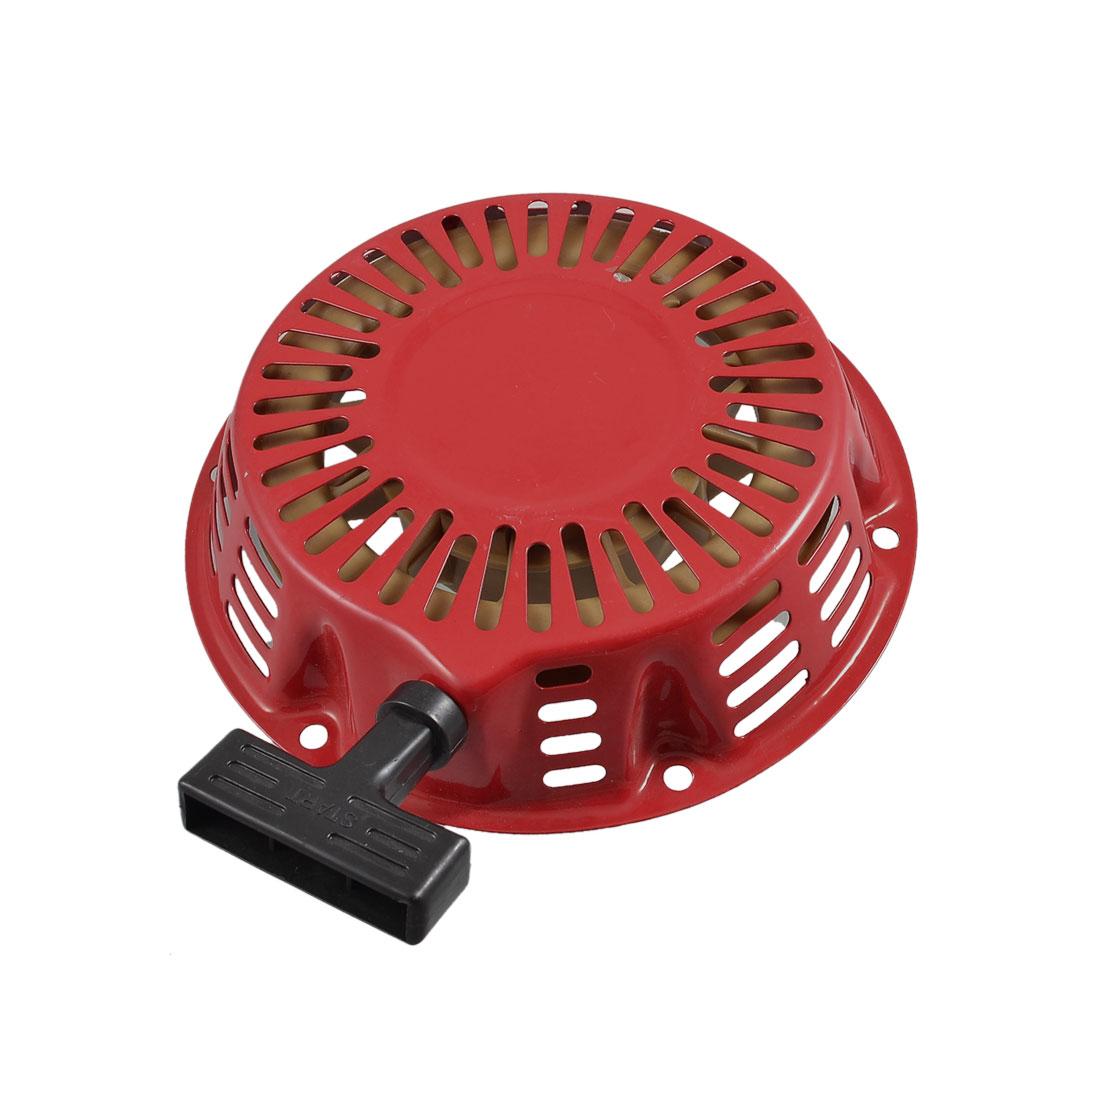 Retractable Rope 173 Generator Lawn Mower Recoil Starter for Honda GX270